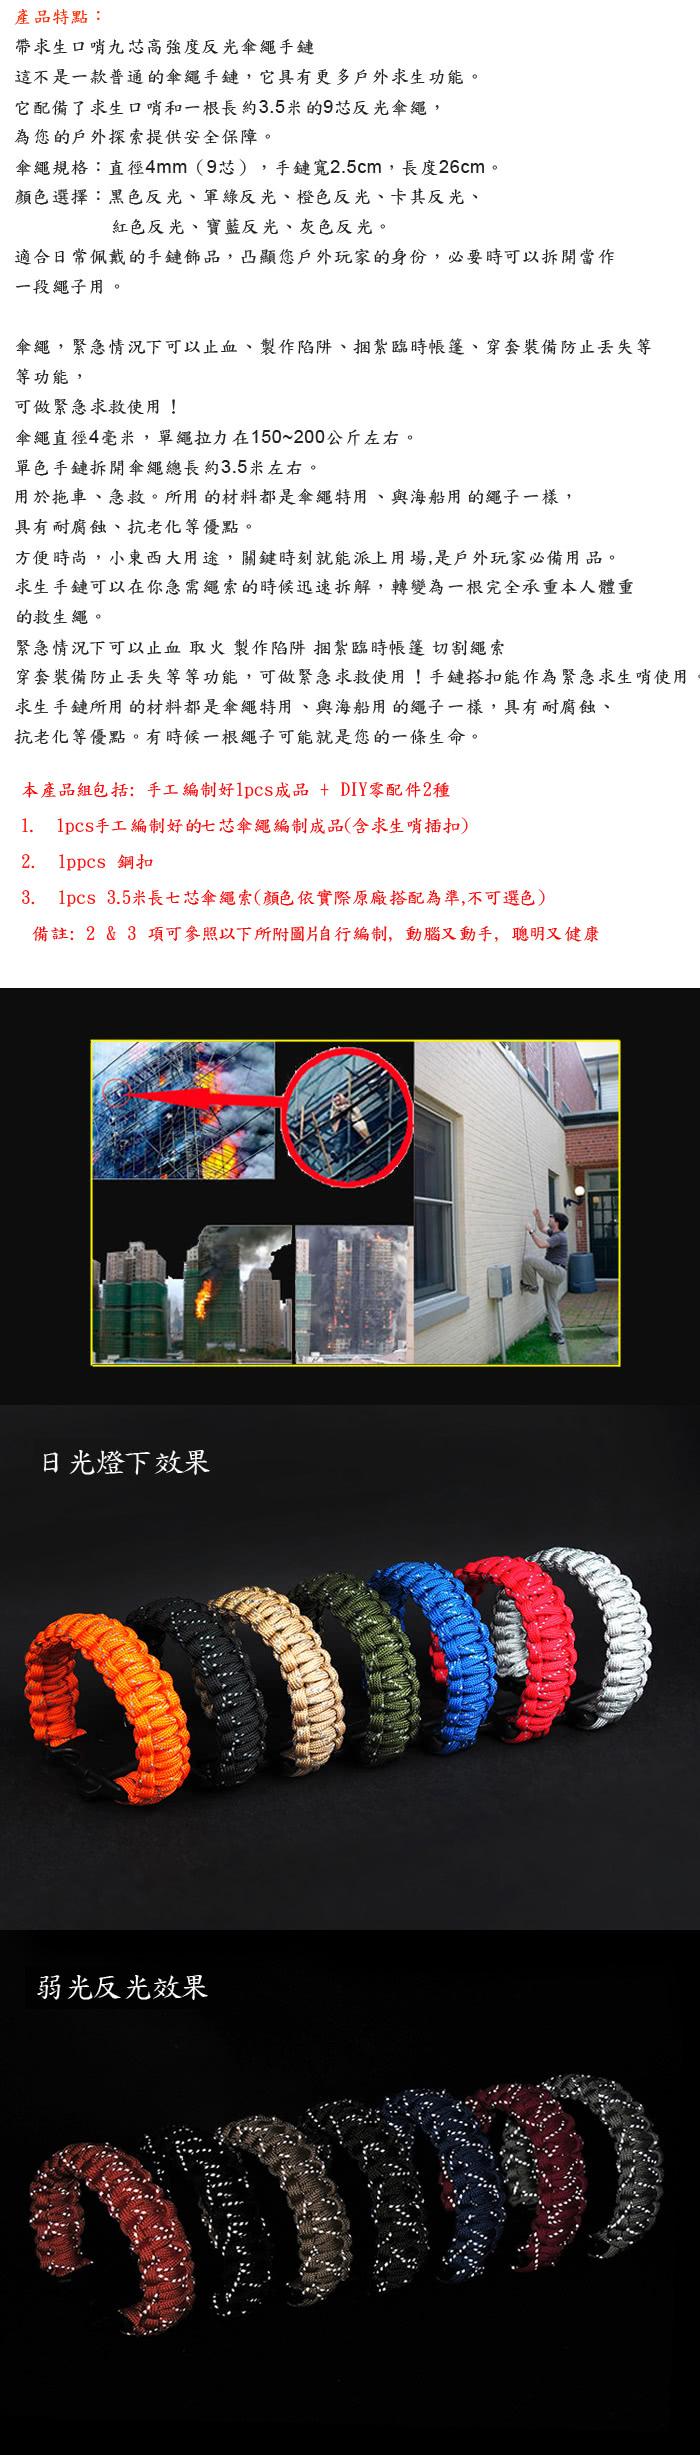 【PUSH! 地震防災產品】時尚的九芯反光繩求生哨(J23)